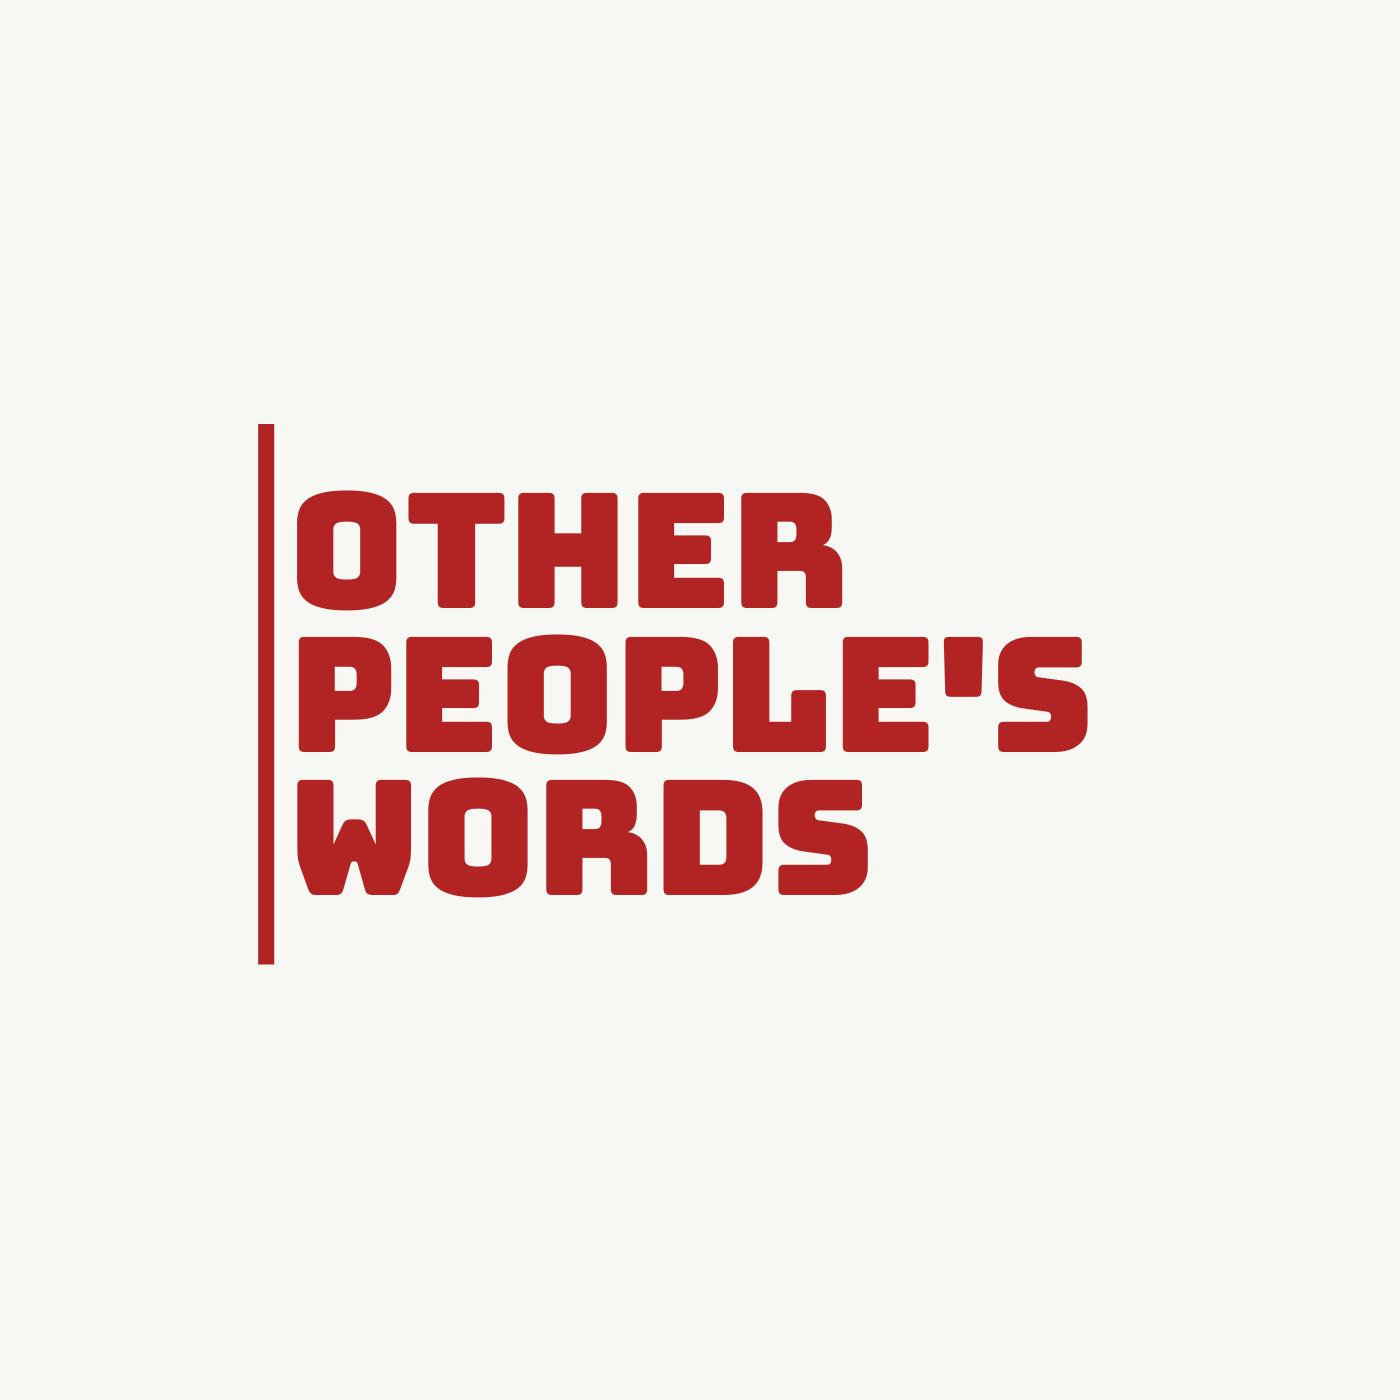 Other People's Words, Episode 11: Works of Love, by Søren Kierkegaard